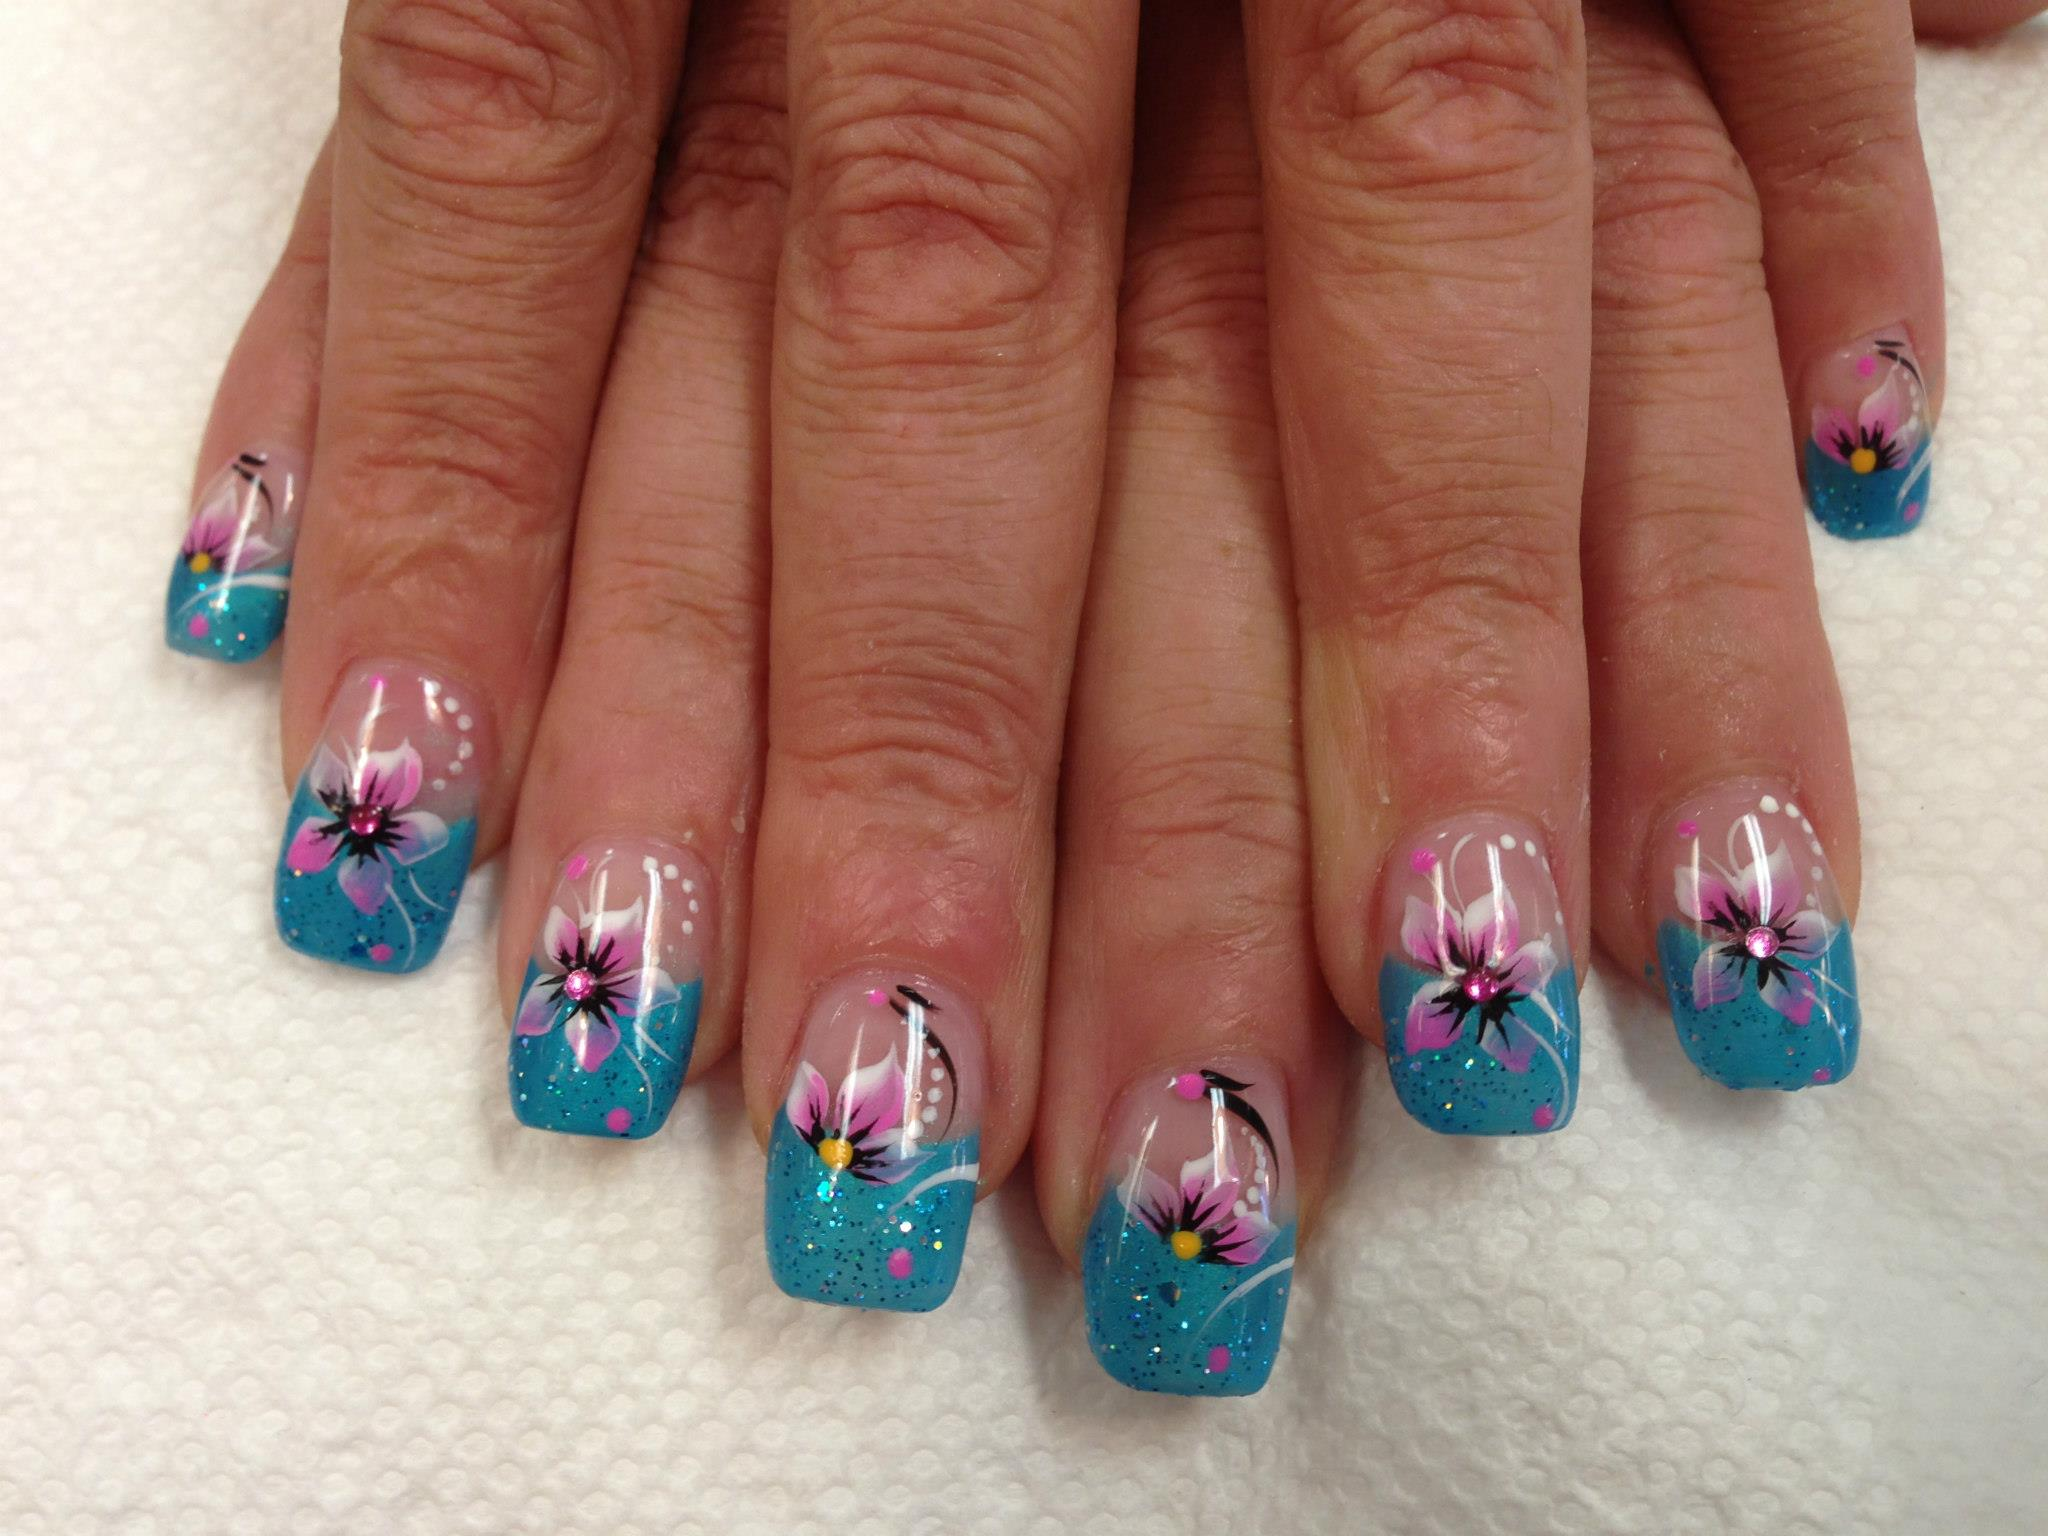 lily of ocean nail art design